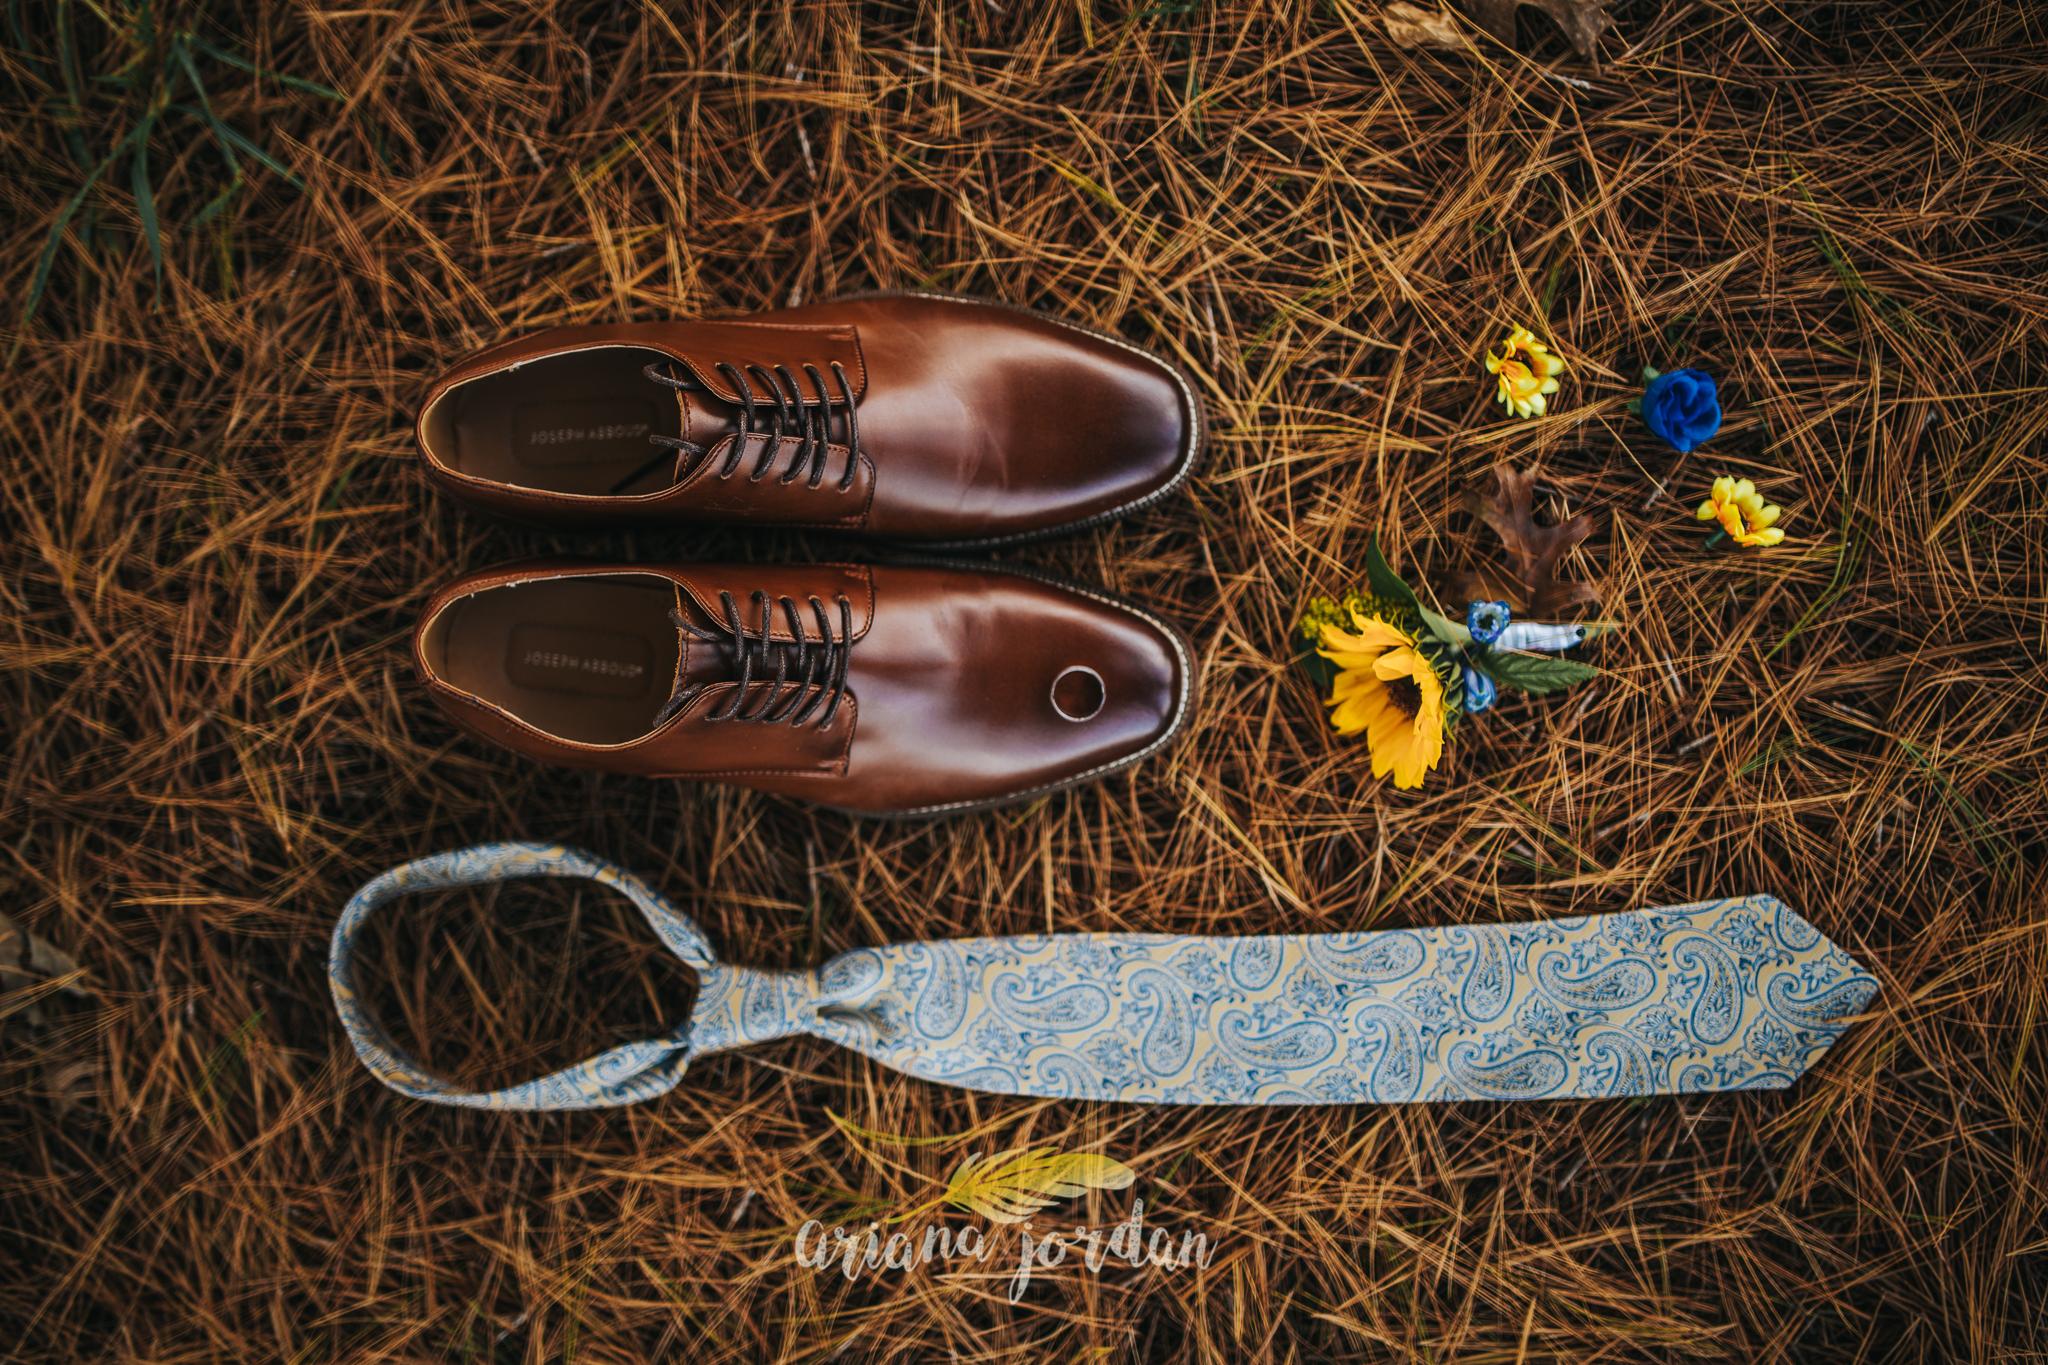 009 Ariana Jordan Photography -Moonlight Fields Lexington Ky Wedding Photographer 1002.jpg